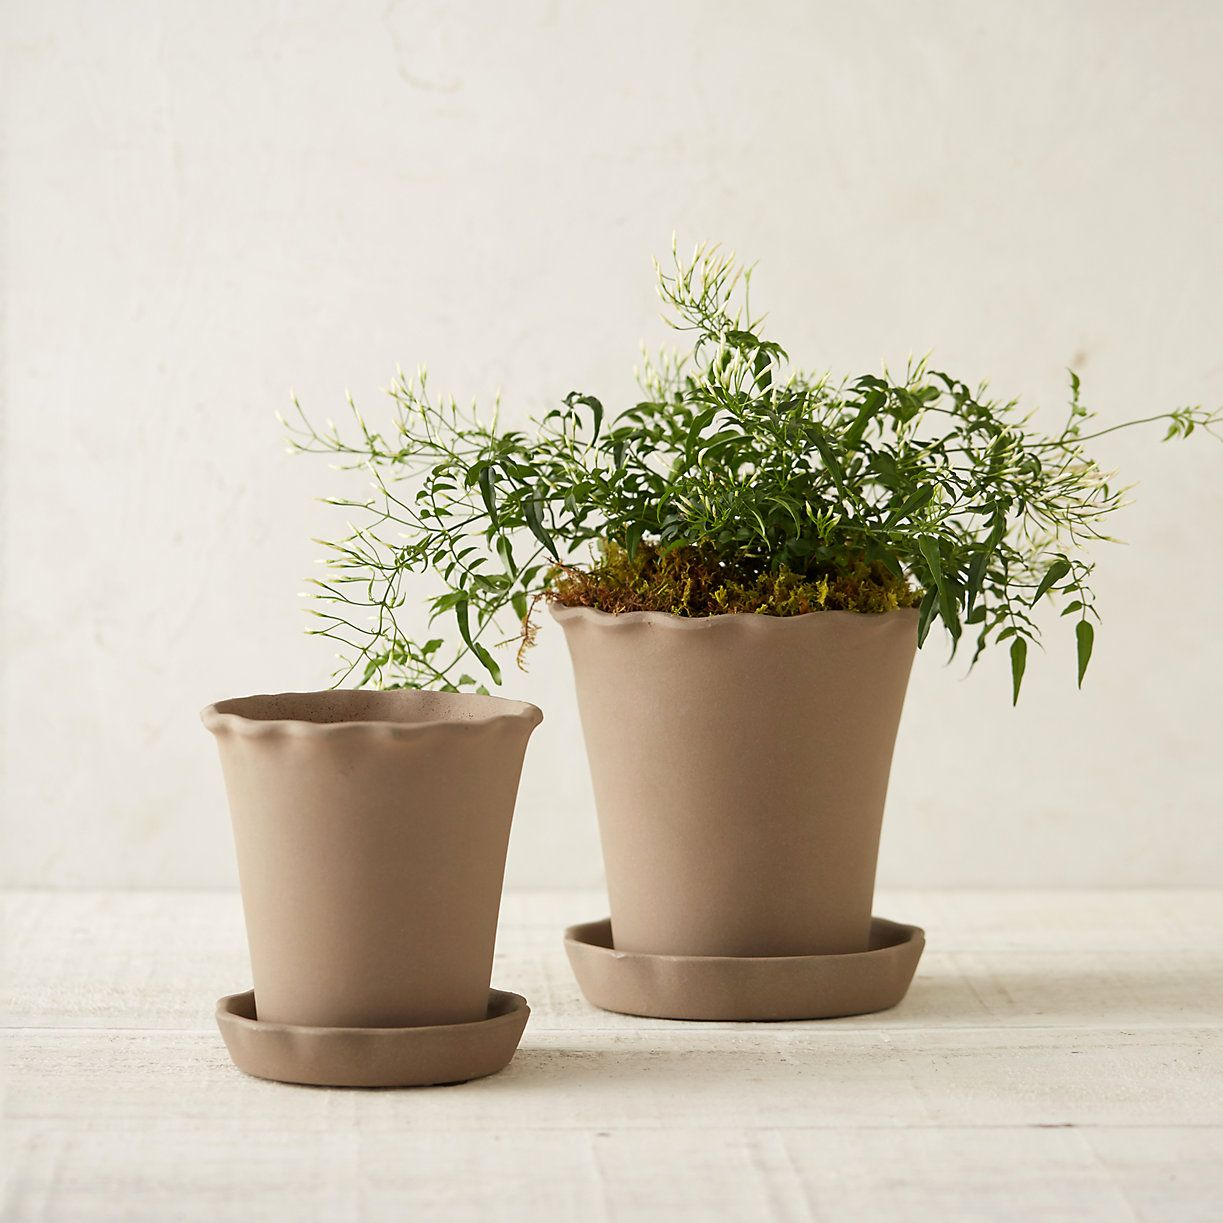 Ruffle Clay Pot & Saucer from Terrain